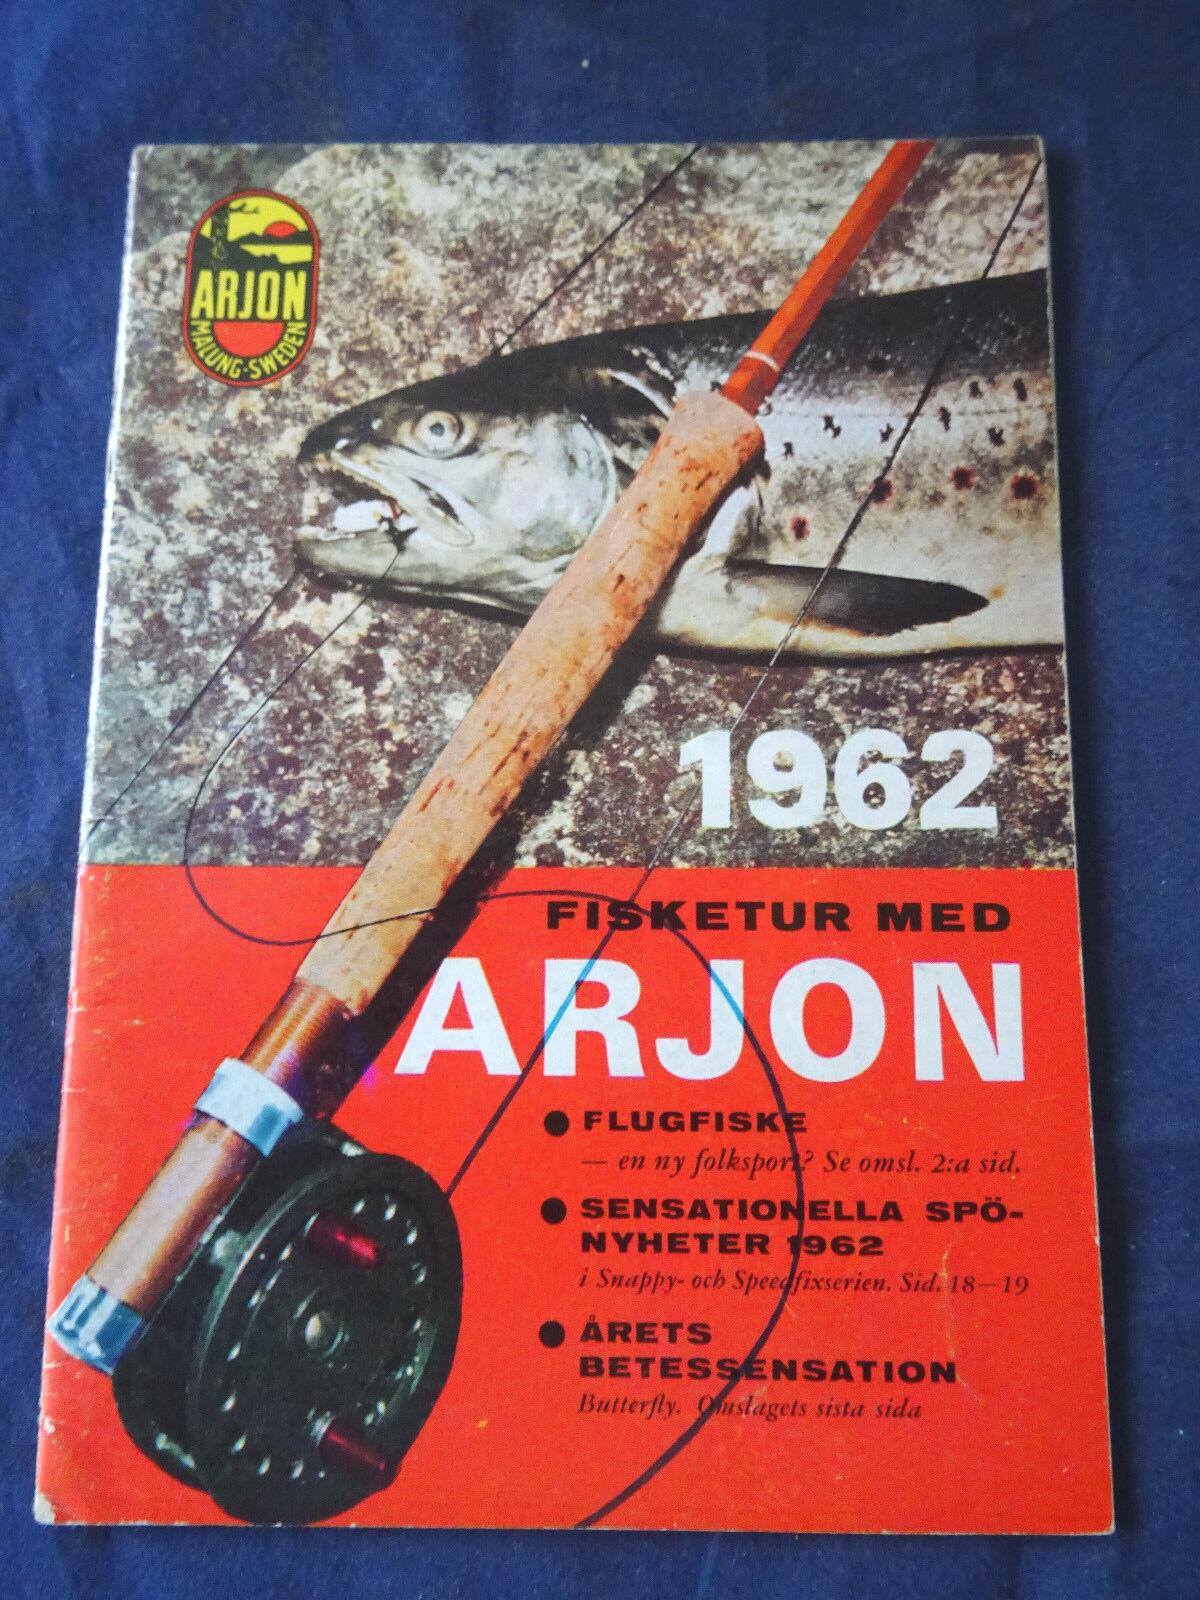 Un raro vintage arjon di Svezia catalogo catalogo catalogo di pesca per 1962 d774d1